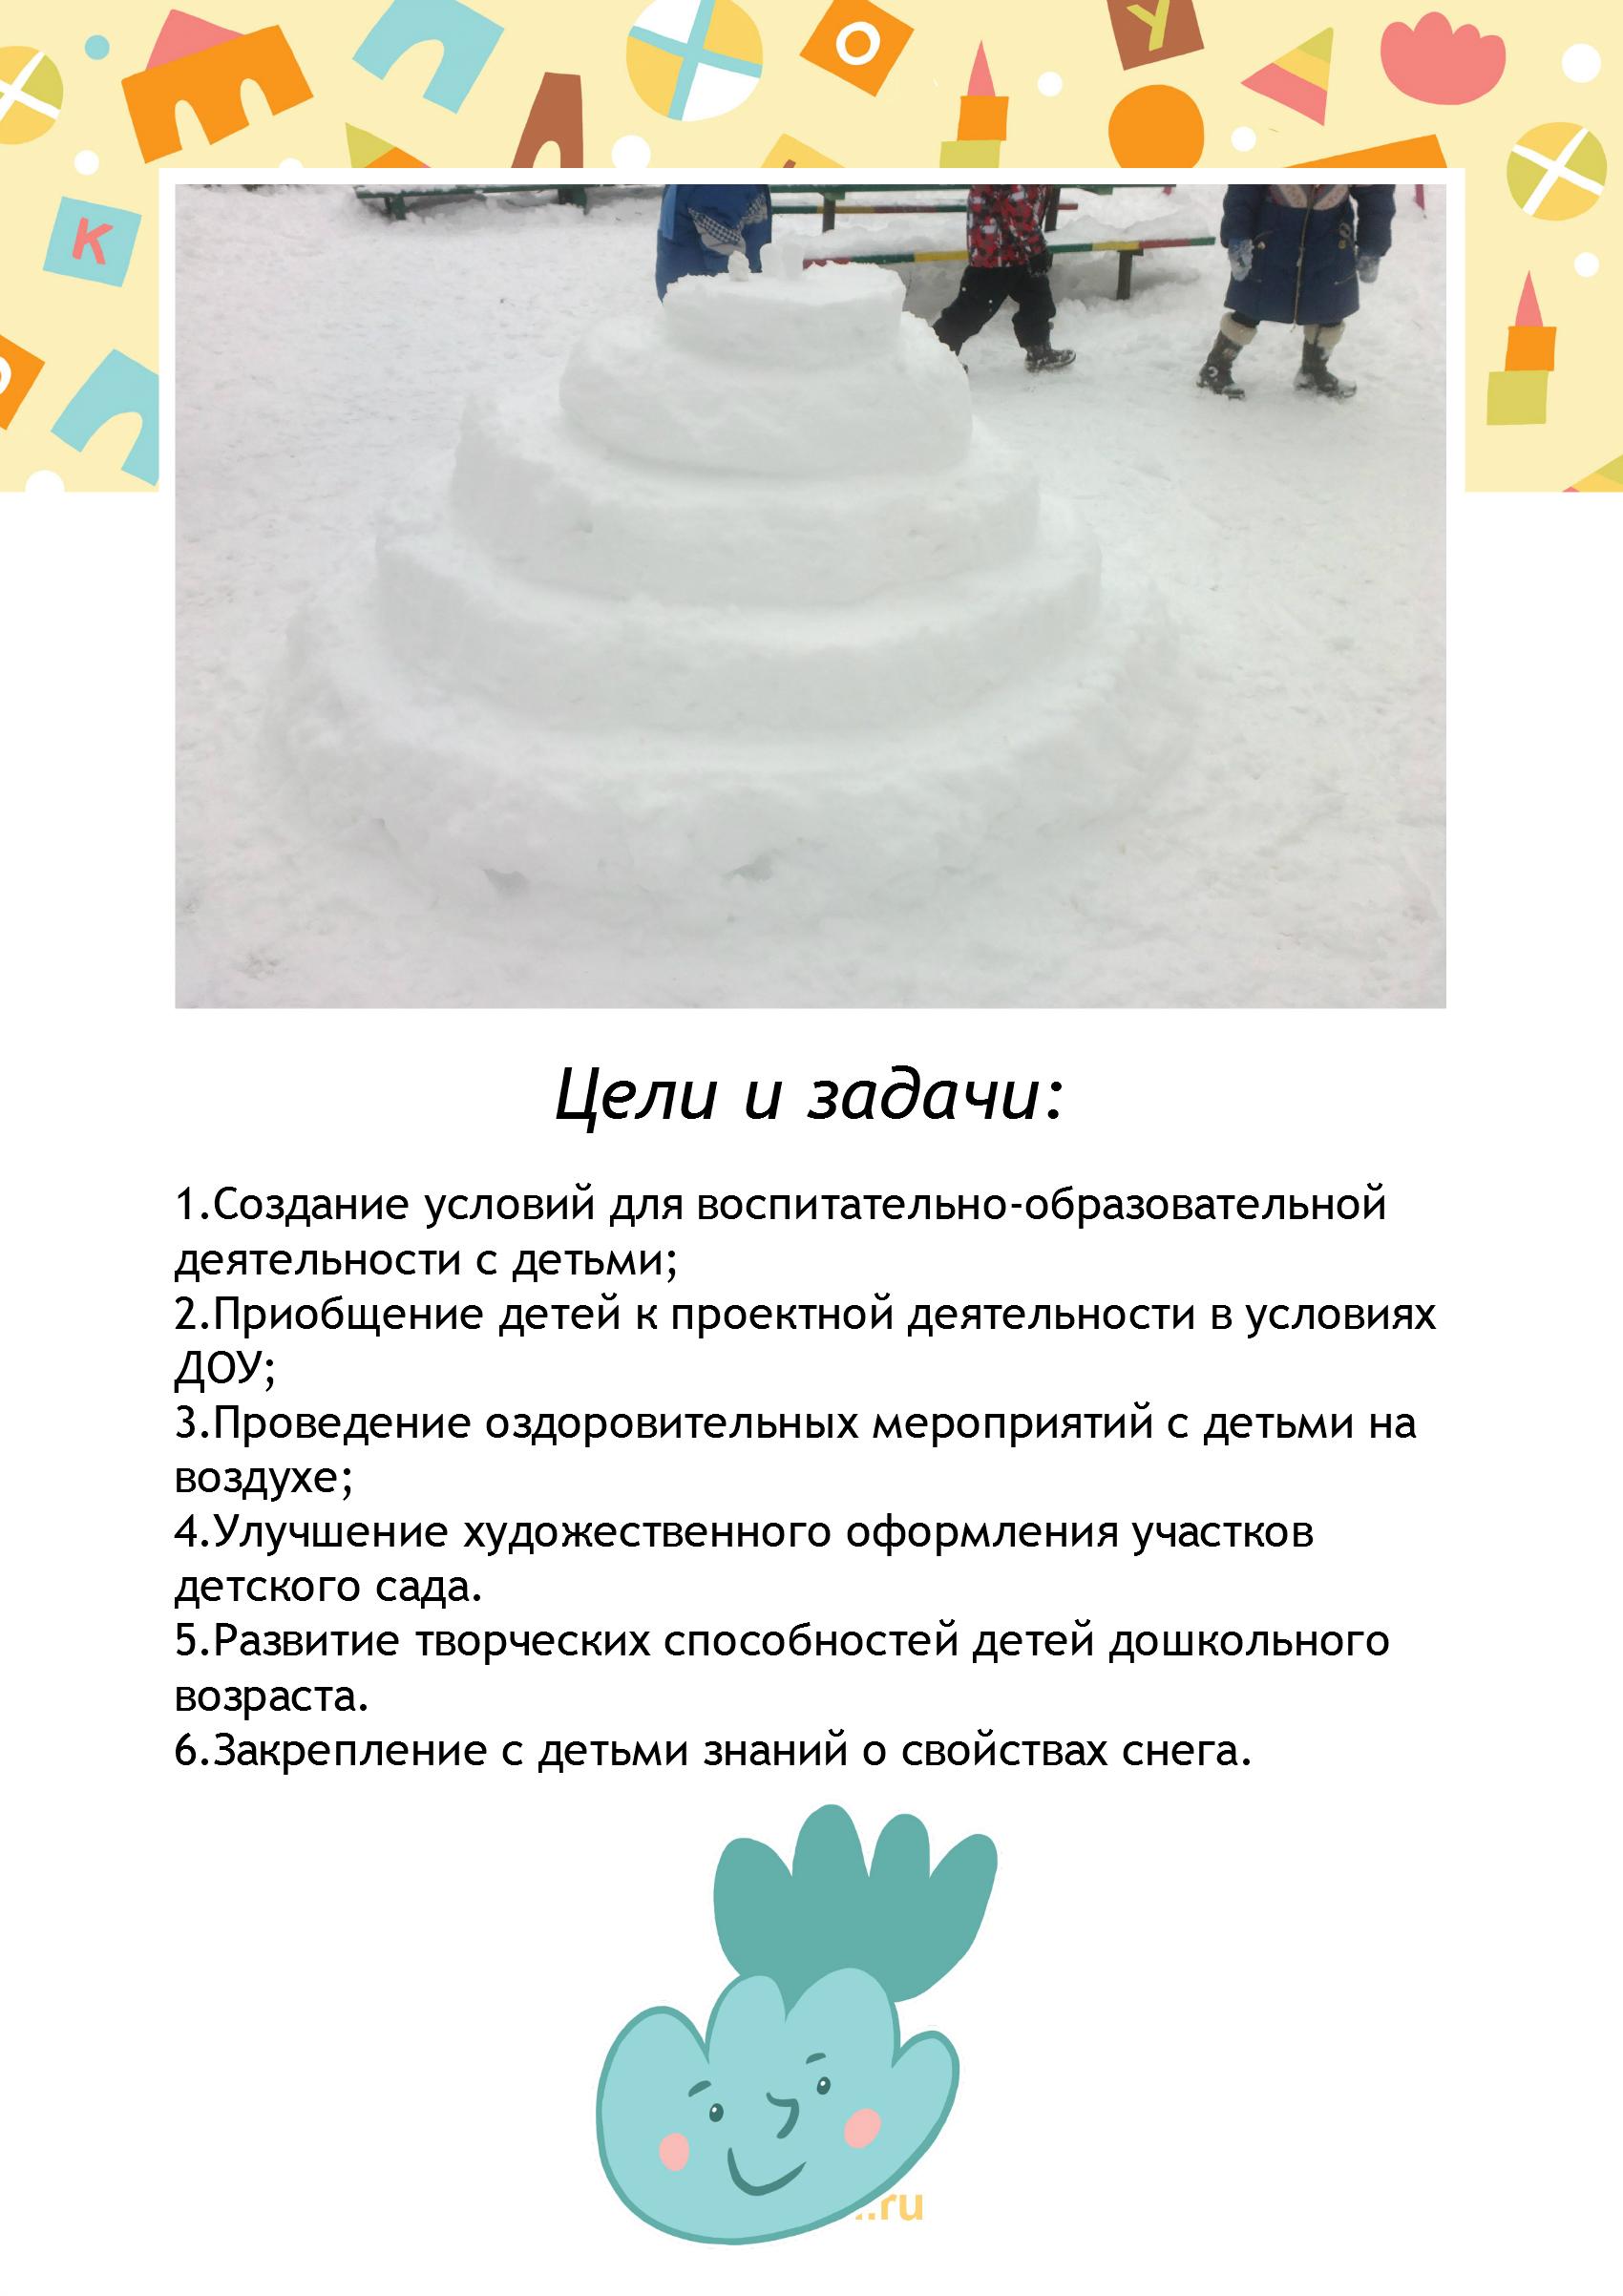 F:\аттестация\Готово\Проект снег\2.jpg